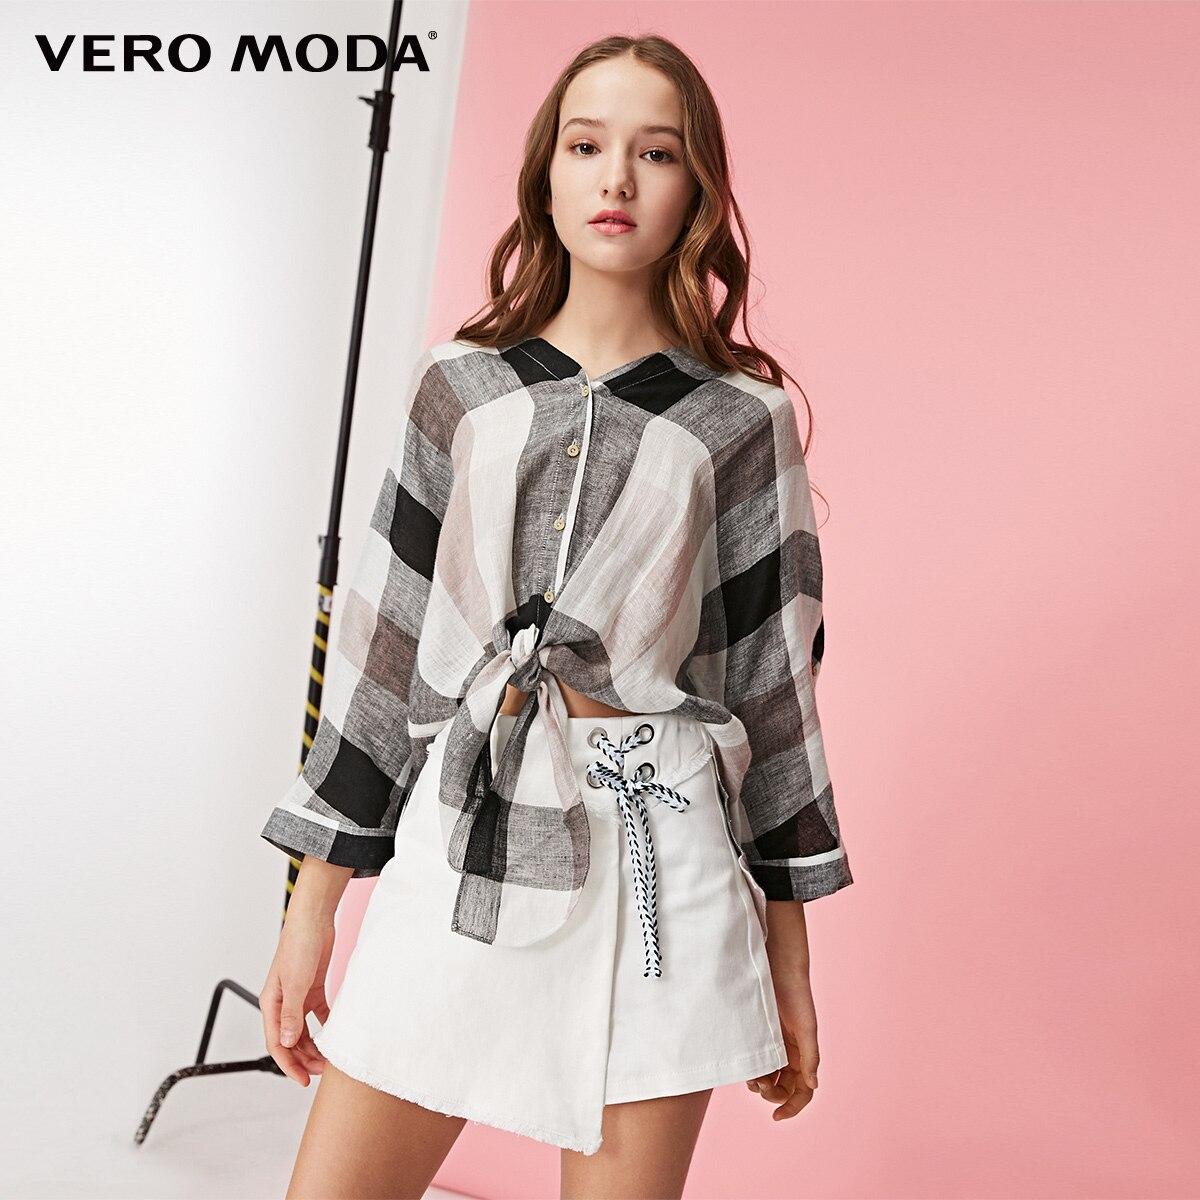 Vero Moda Women's Linen Plaid Lace-up Sleeves Shirt | 319131537